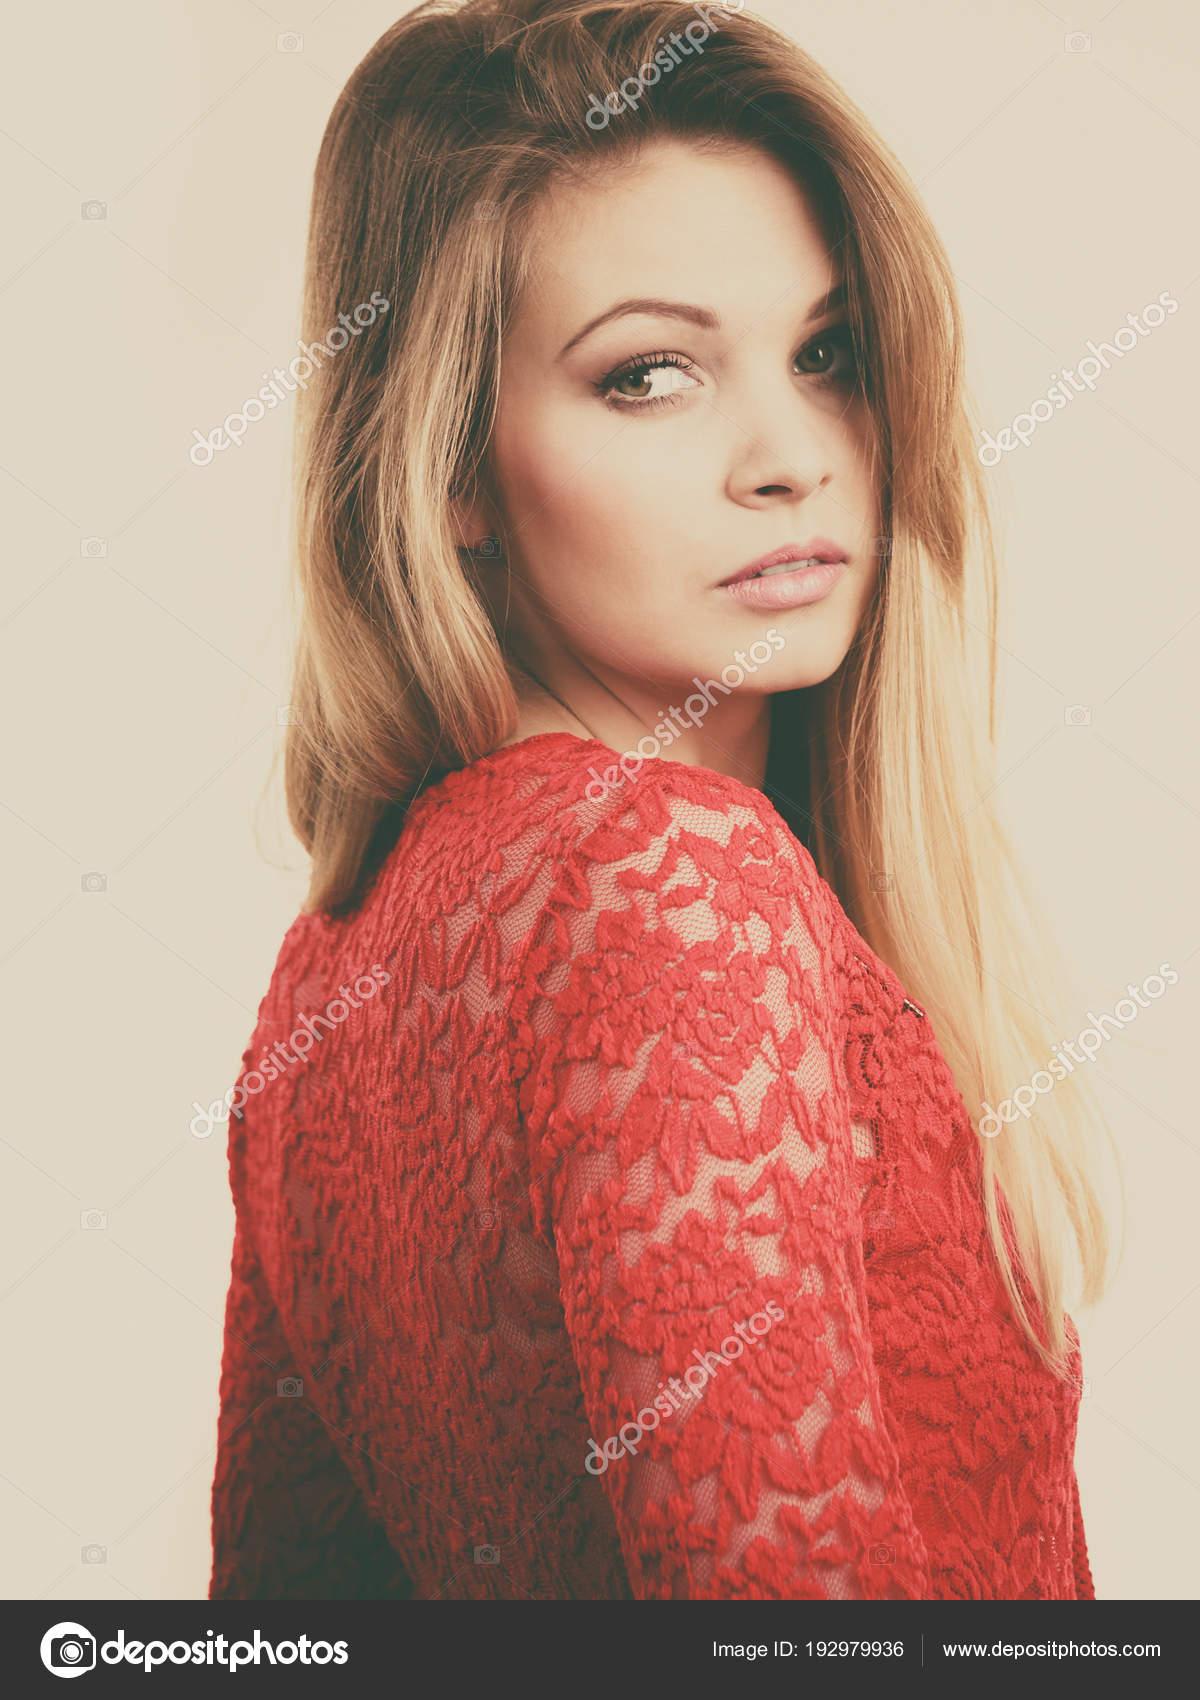 516fa0838c445a Elegant young woman wearing red top — Stock Photo © Anetlanda #192979936